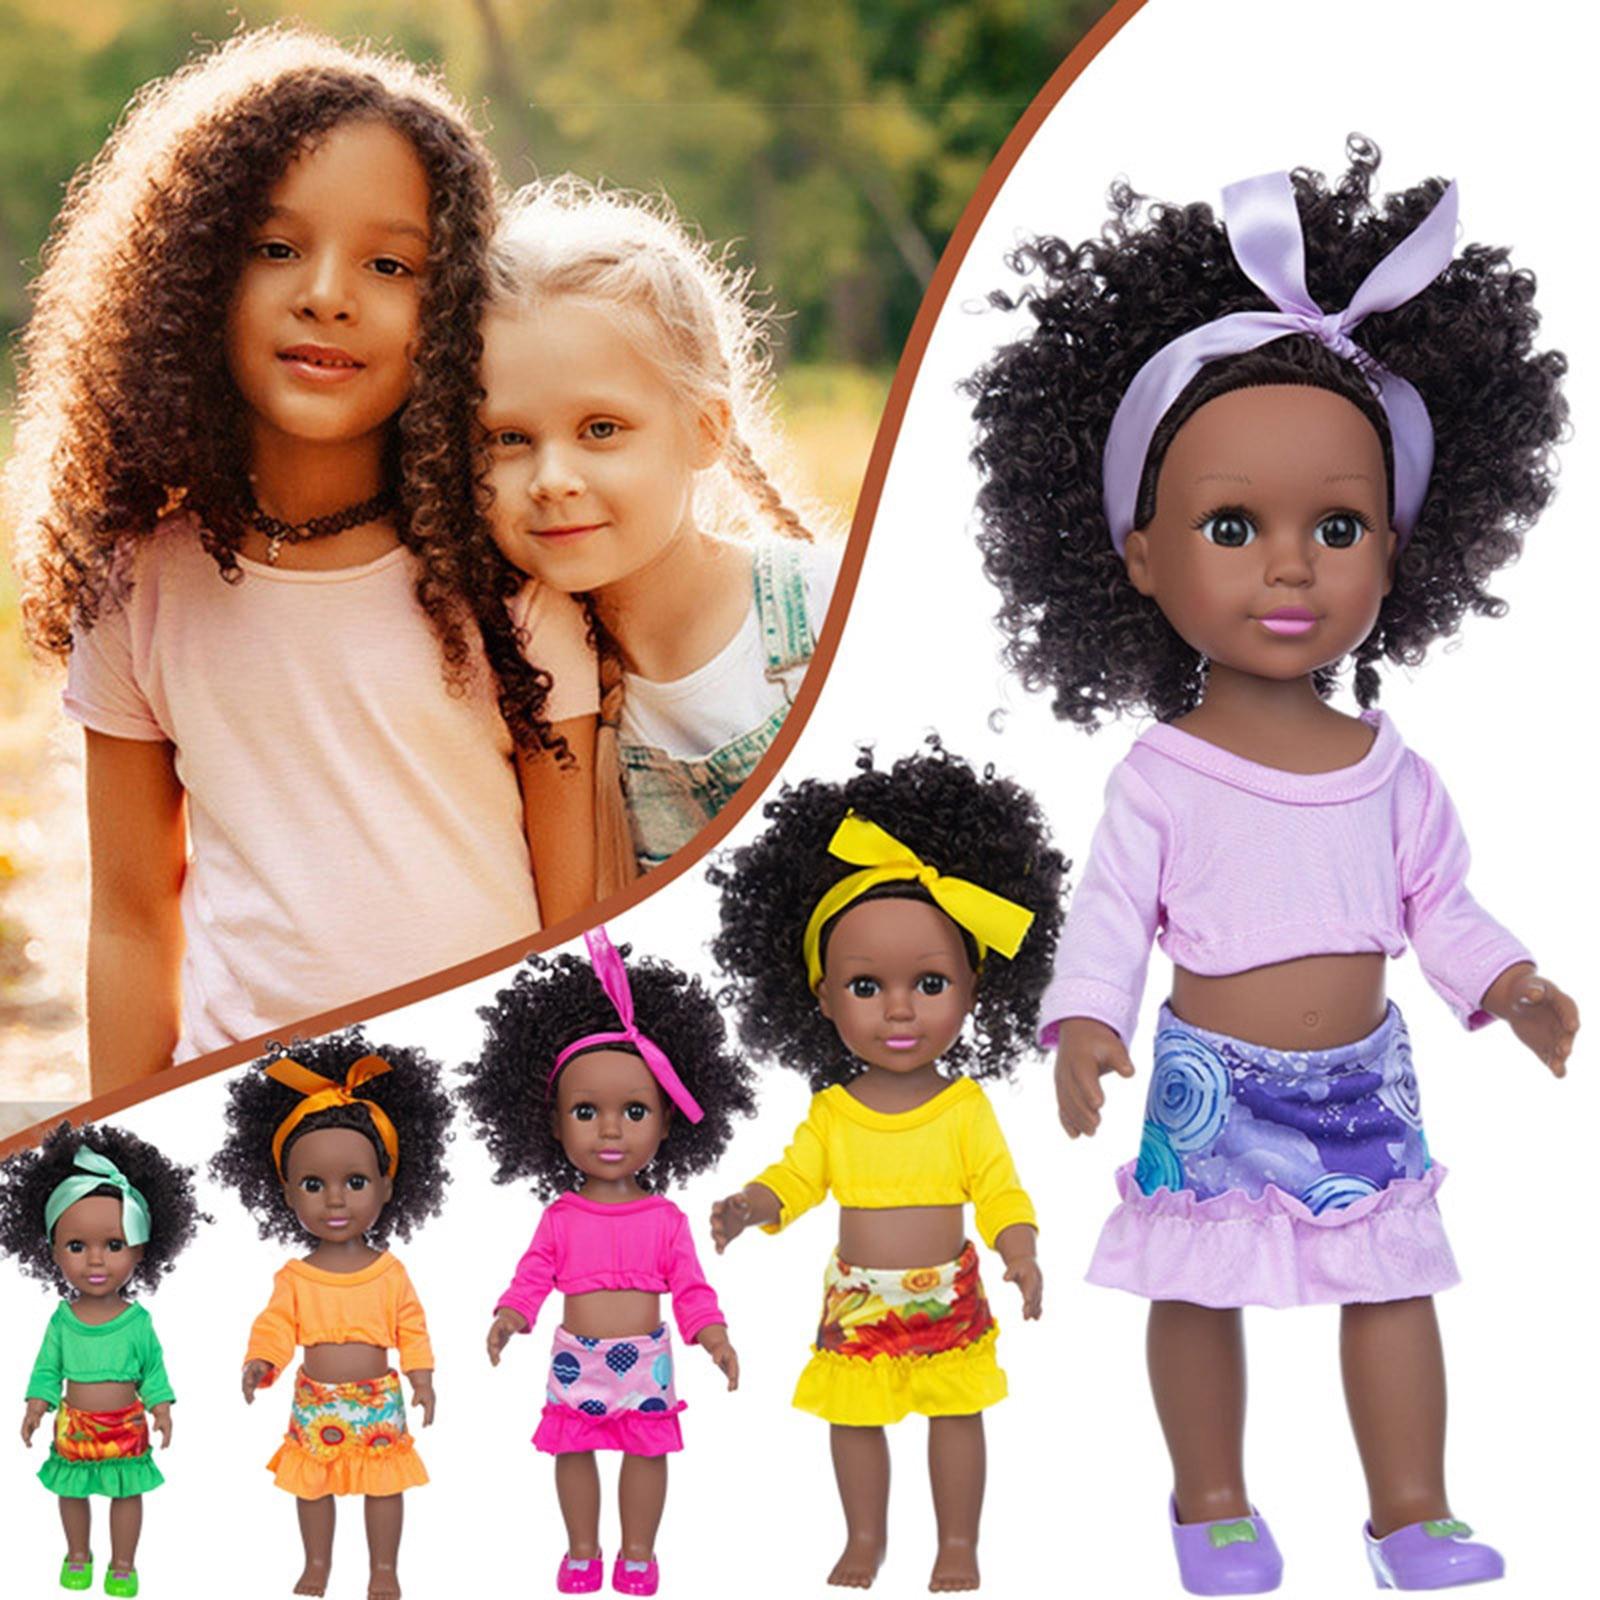 Africano boneca de brinquedo do bebê boneca preta melhor presente móvel conjunta preto africano bebê bonito encaracolado cabelo vinil boneca recém-nascido brinquedo da boneca do bebê